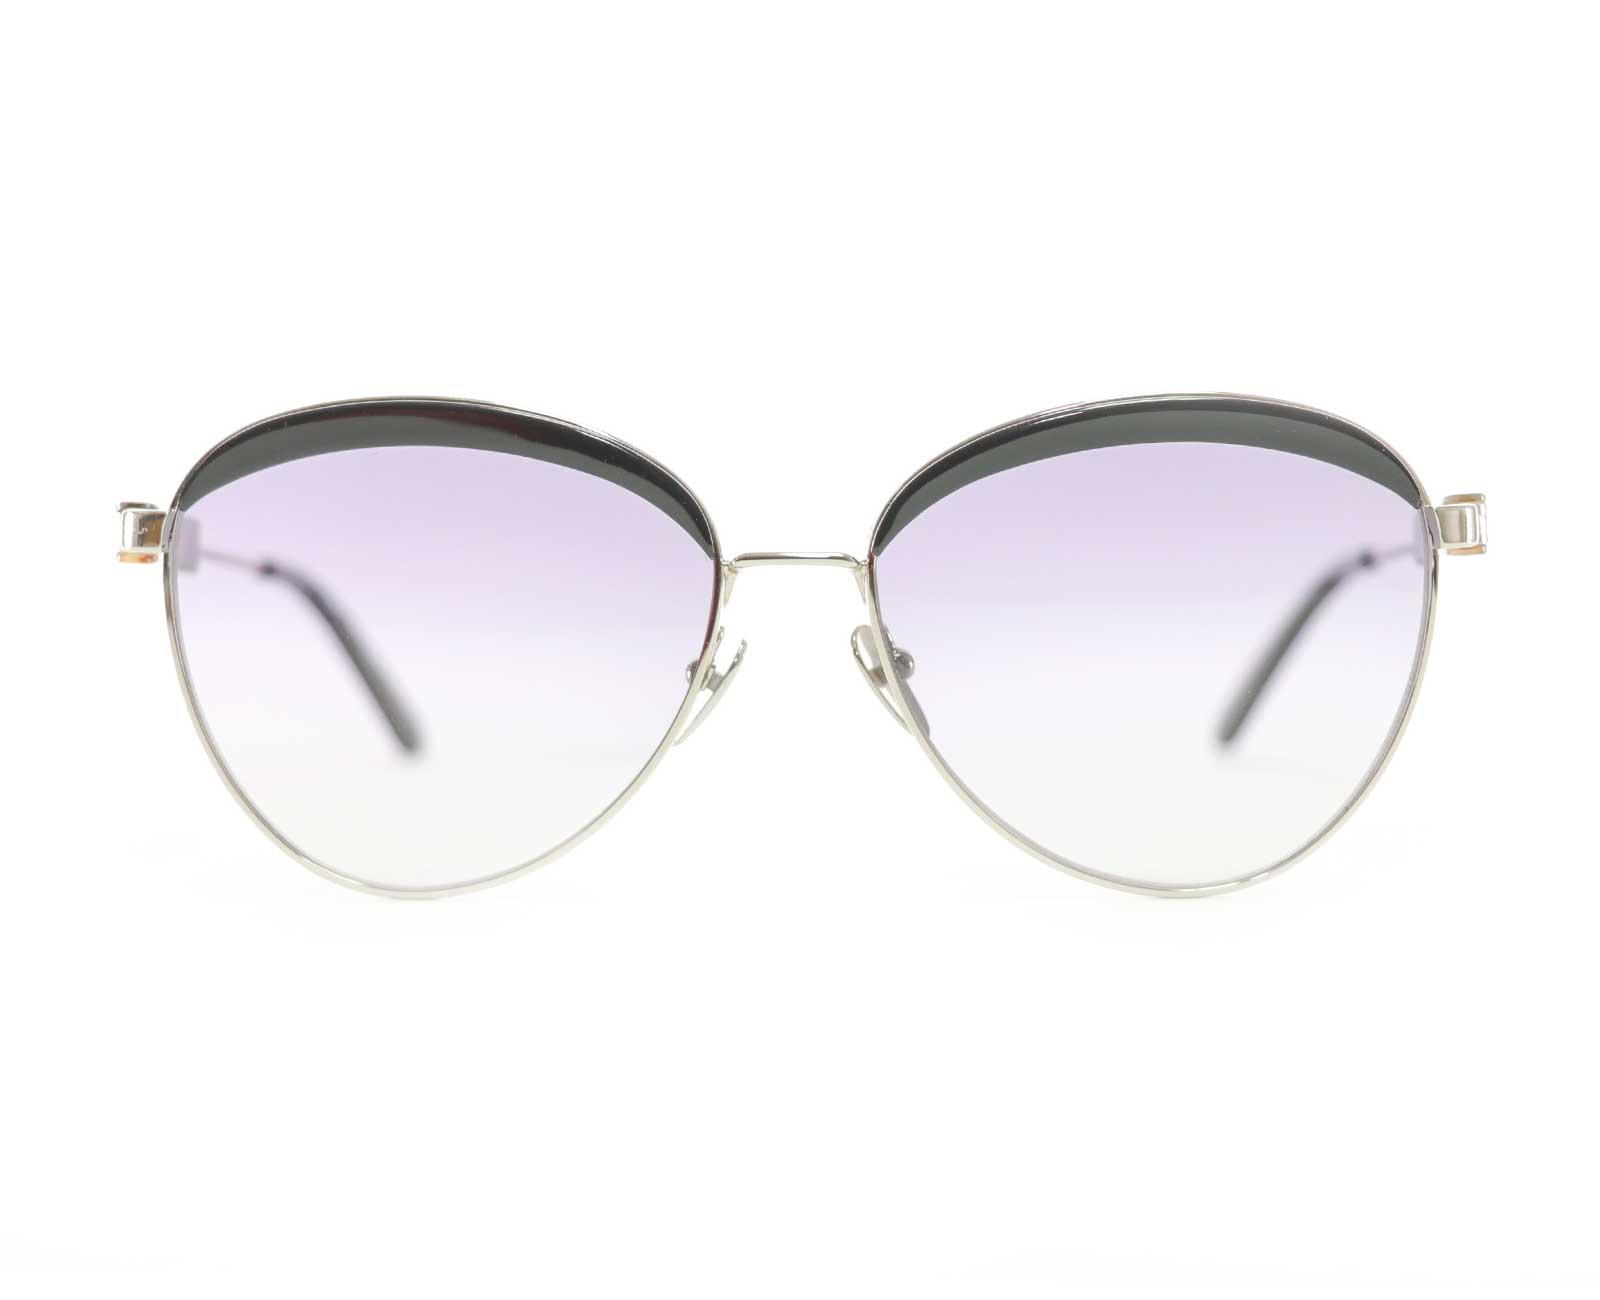 Calvin Klein CK19101S Sunglasses in Black/Silver